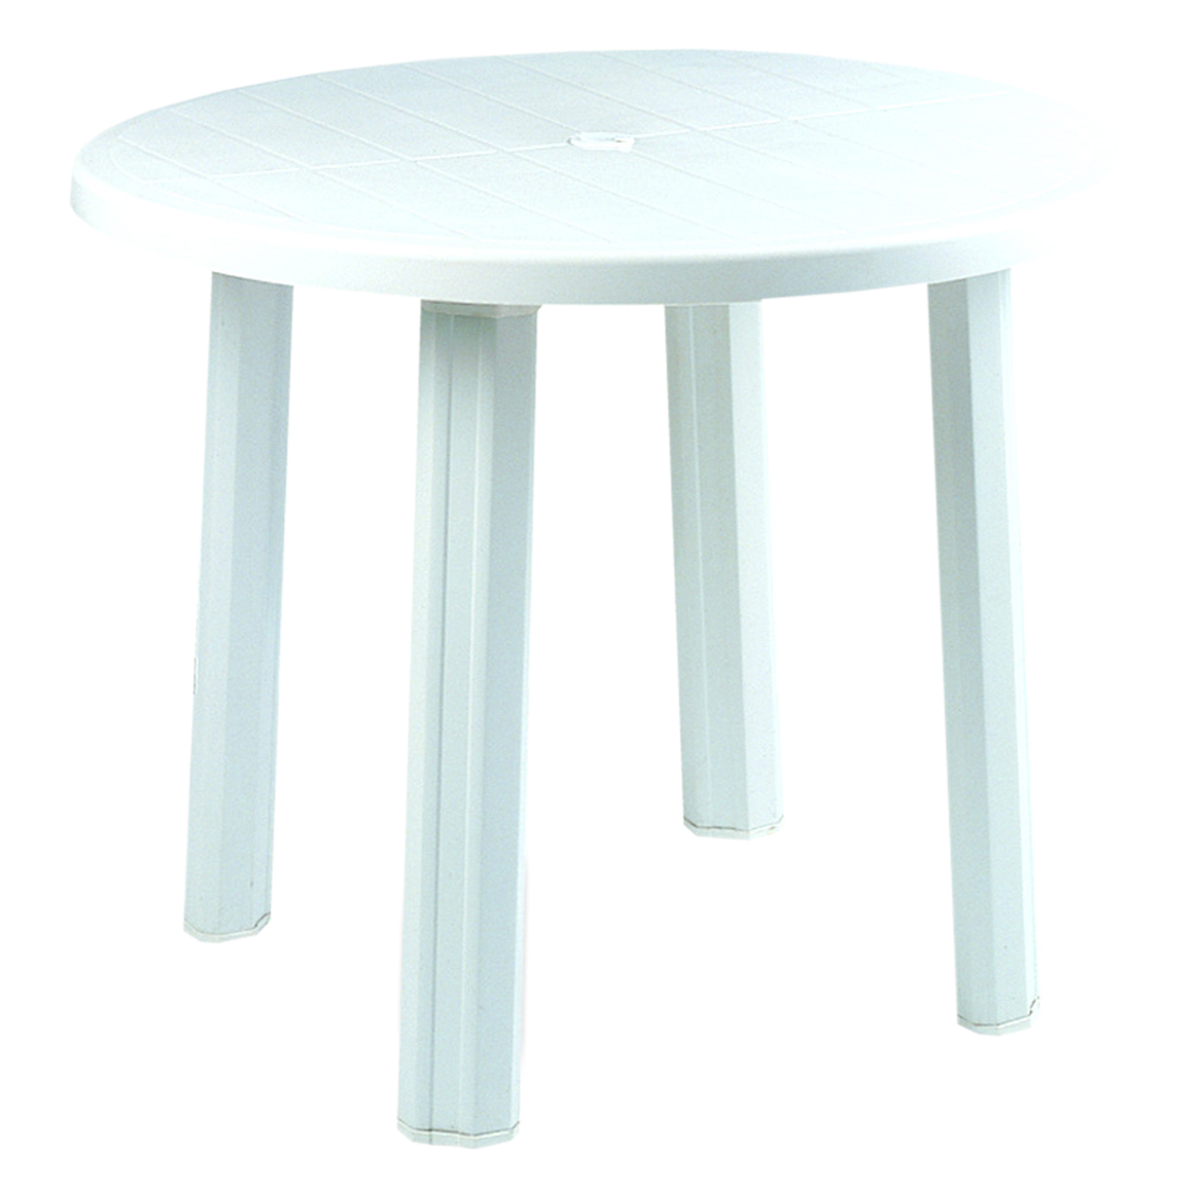 Table jardin blanc internation moduling - Table jardin blanc versailles ...